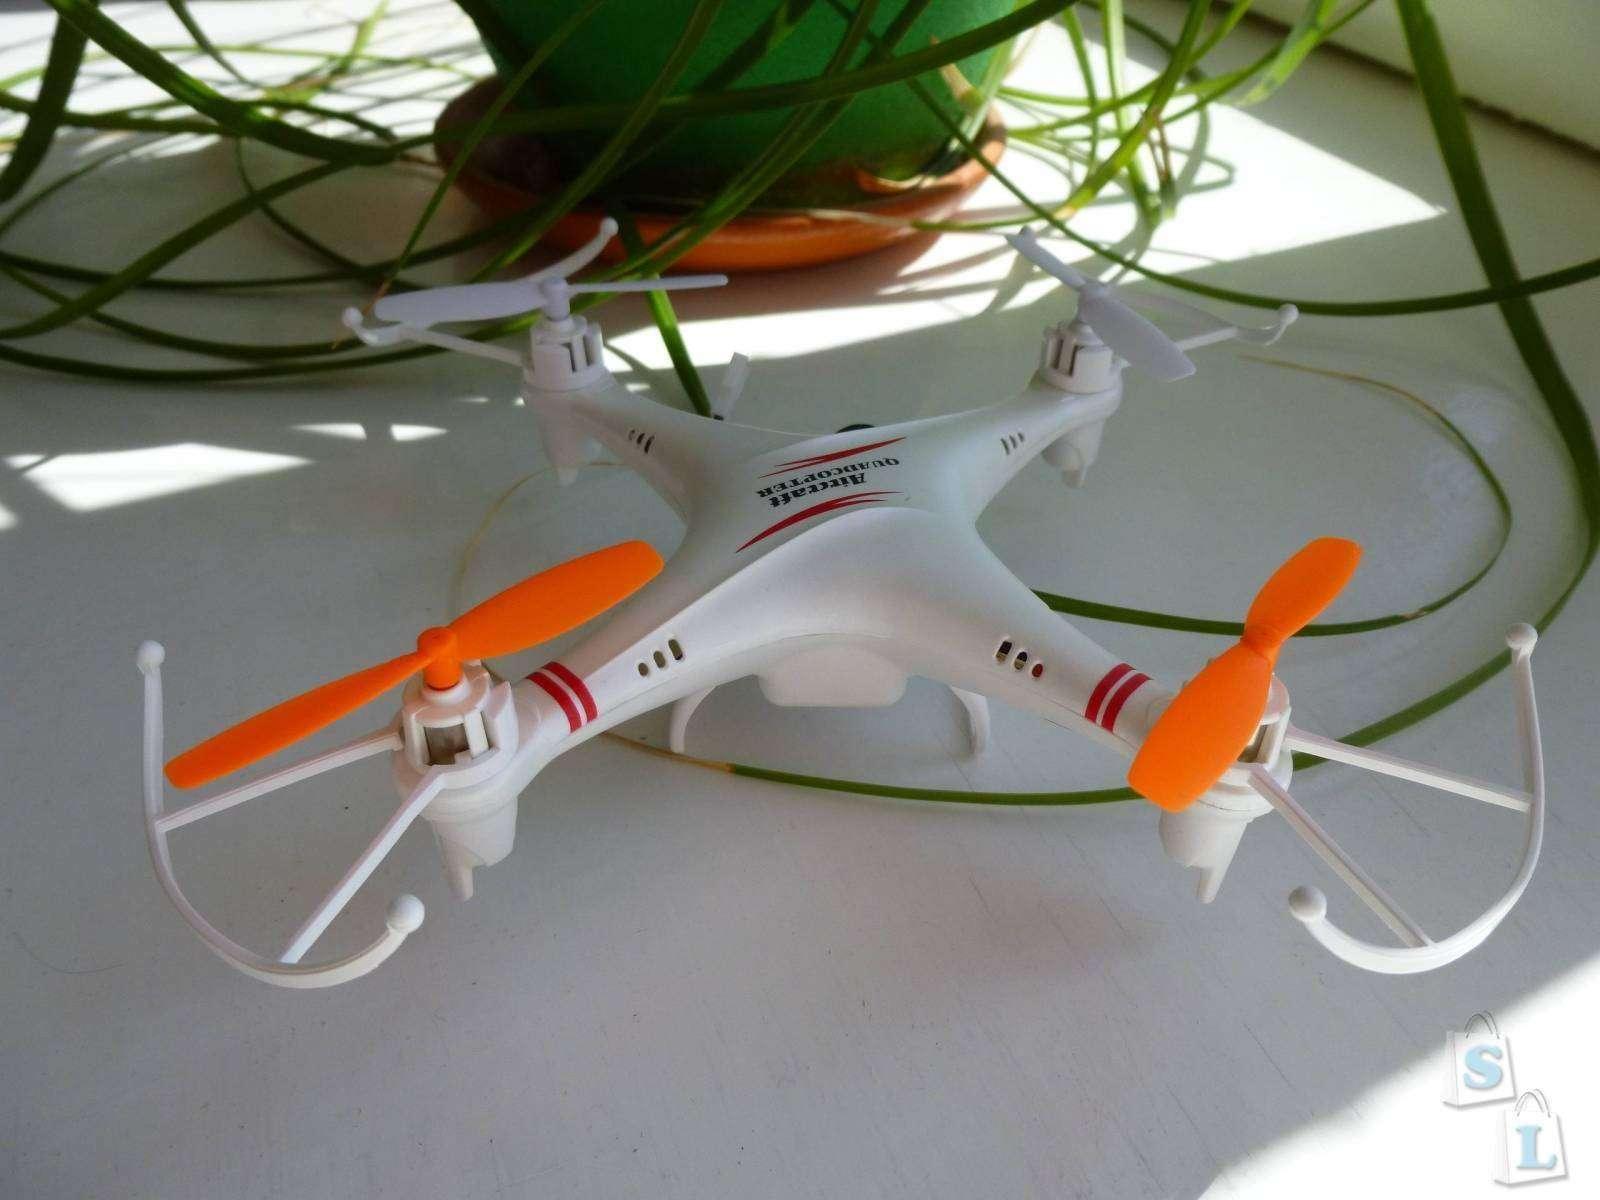 GearBest: Квадрокоптер 'для дома' на выбор: SYMA X12 И SKYTECH M62